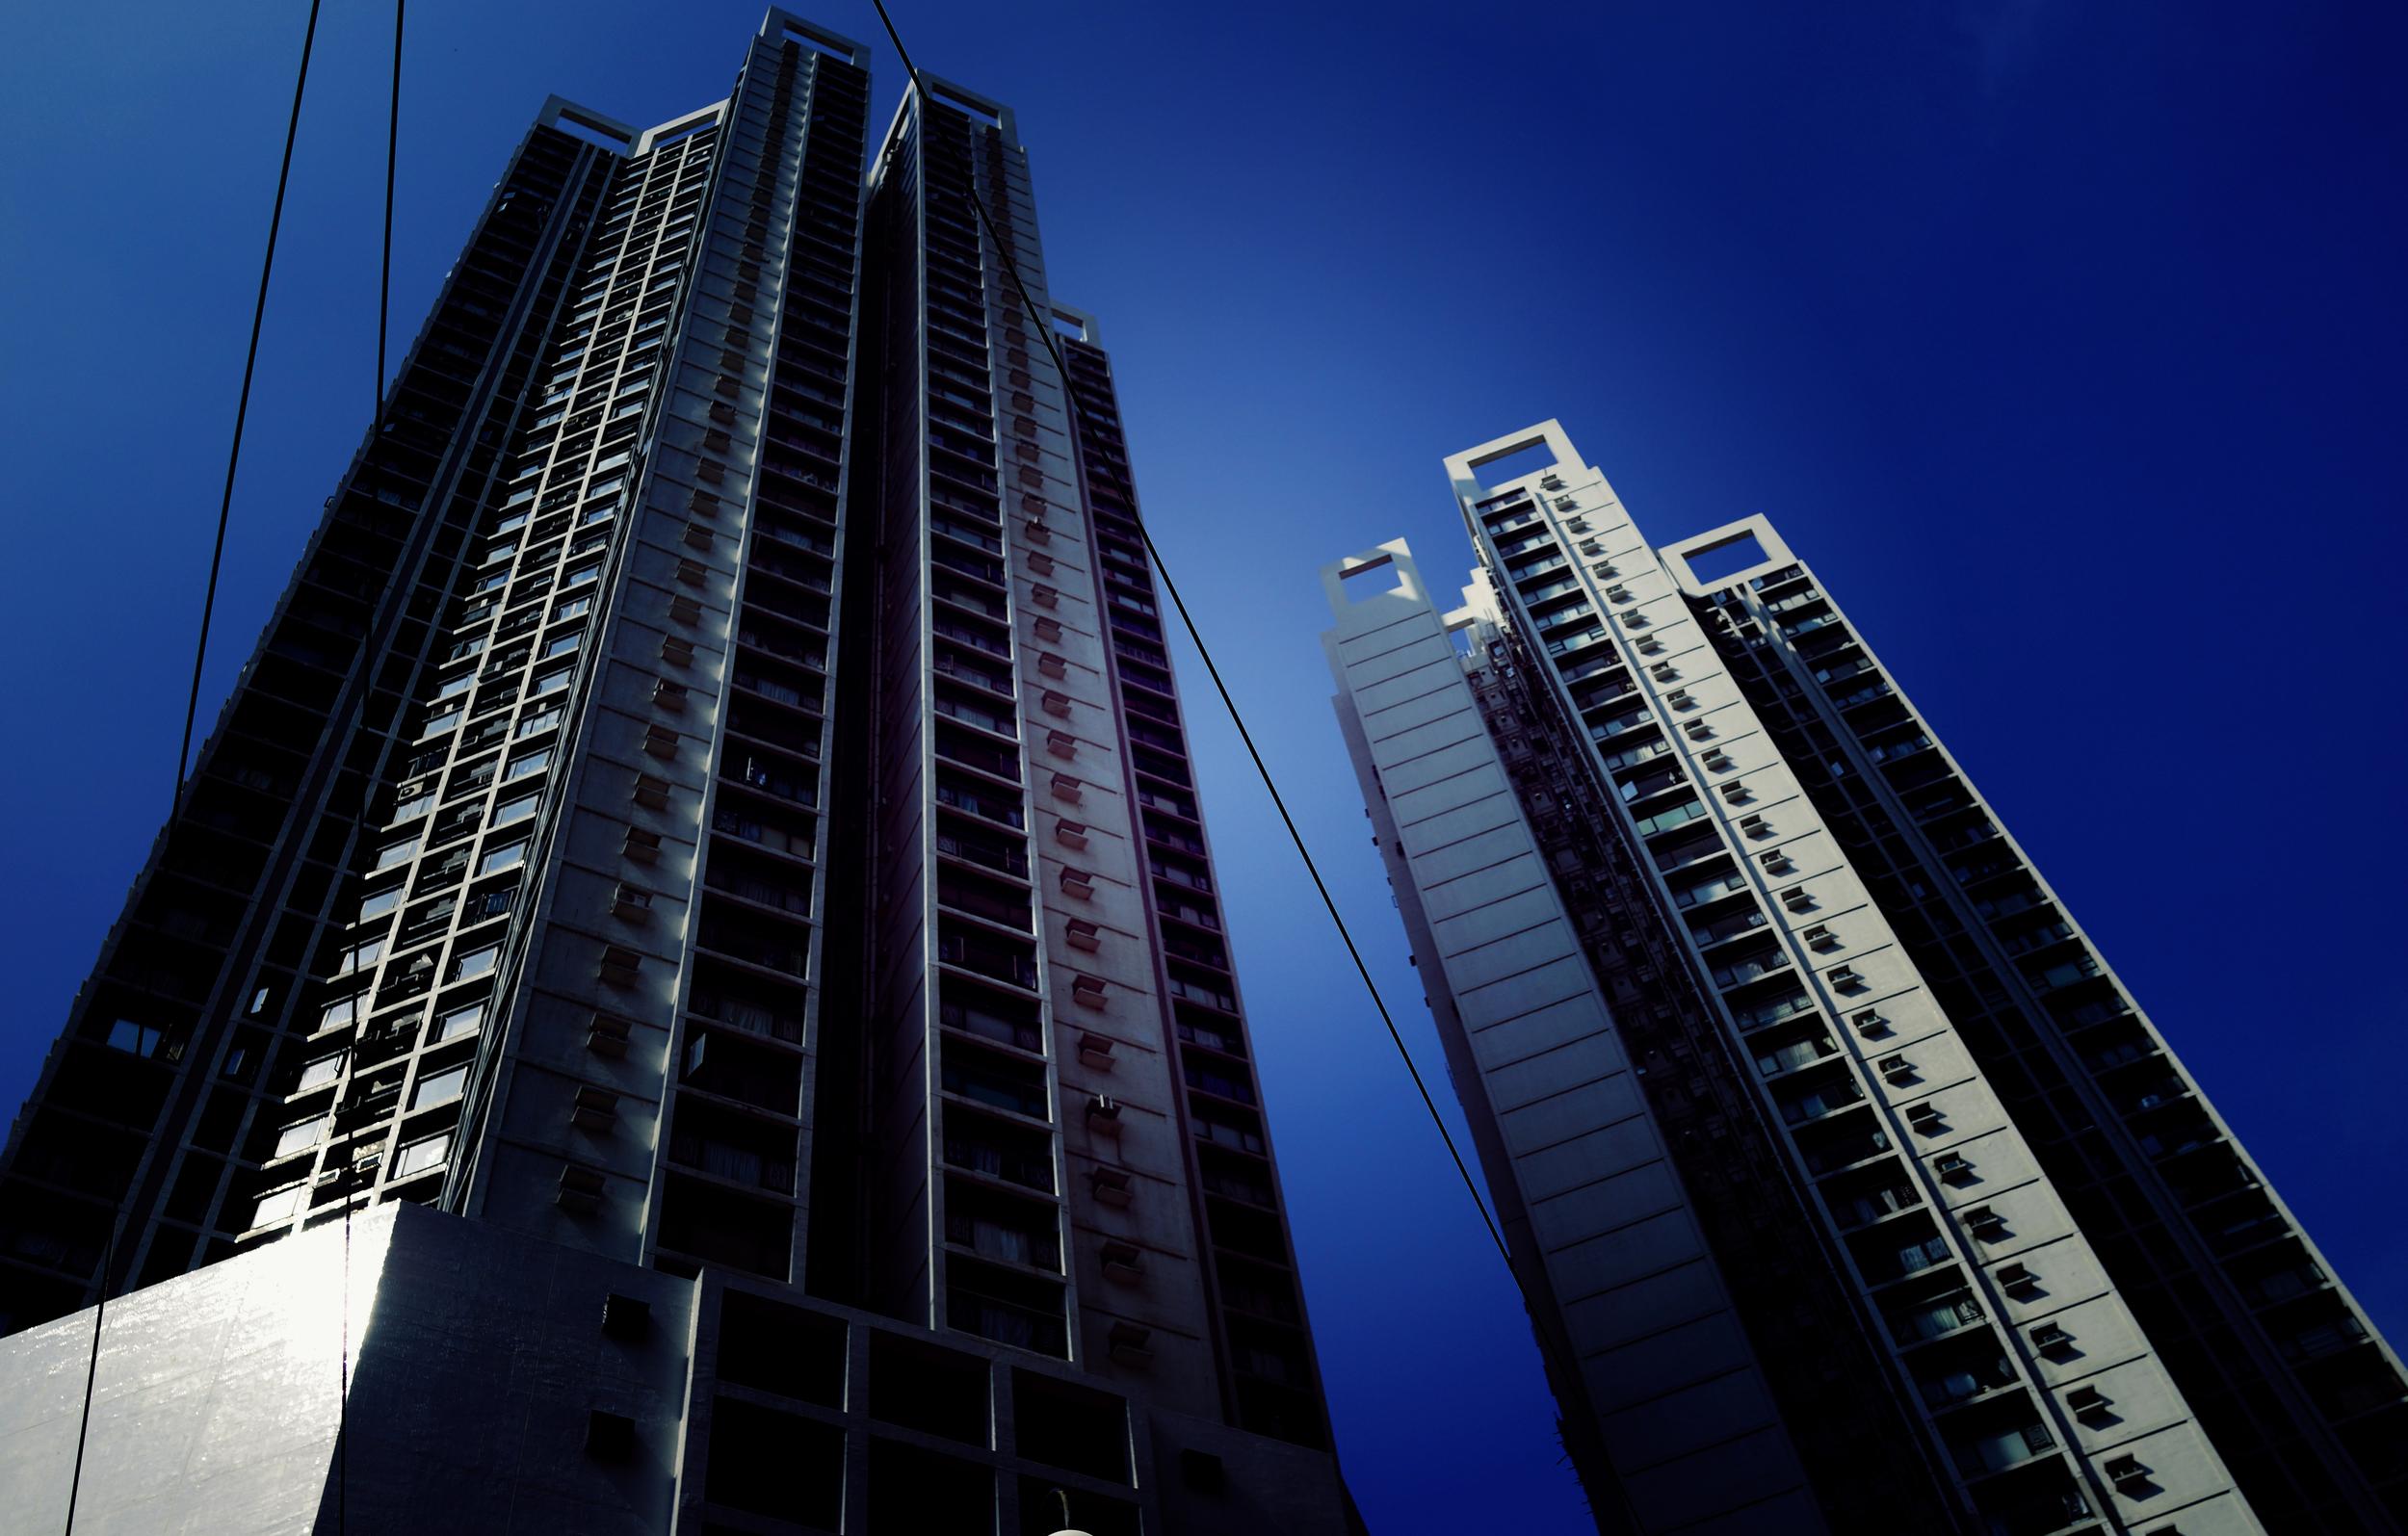 Apartment blocks in Tin Hau near Causeway Bay